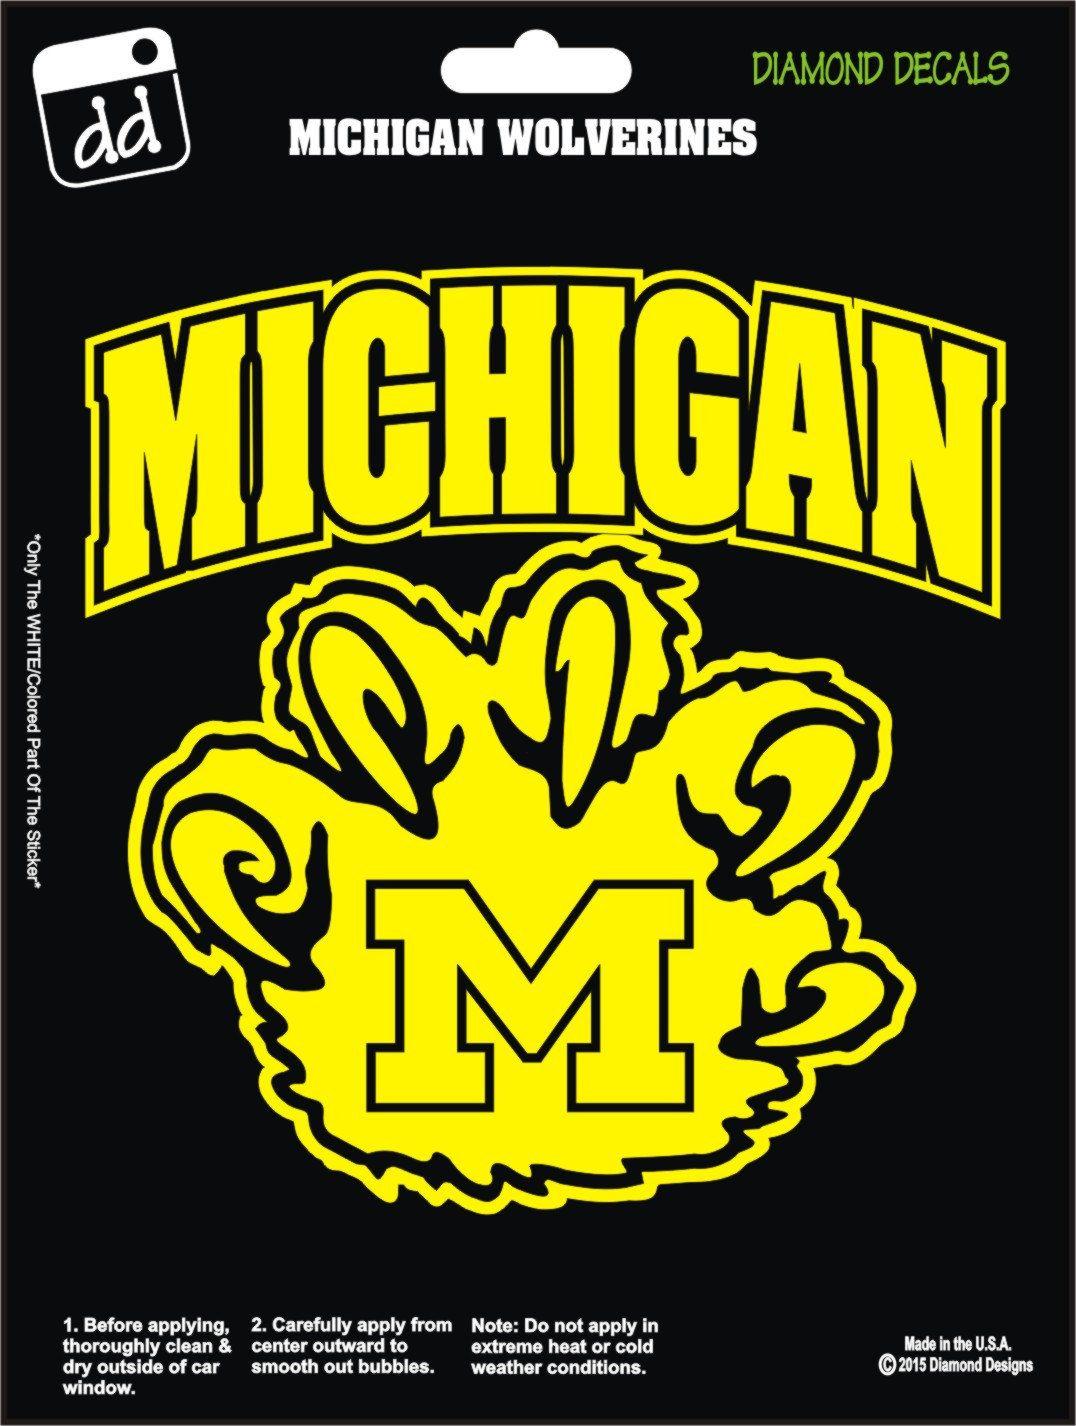 Michigan Wolverines Claw College Football Decal Vinyl Sticker Car Truck Laptop Phone Window Football Decal Michigan Wolverines Wolverine Claws [ 1426 x 1076 Pixel ]